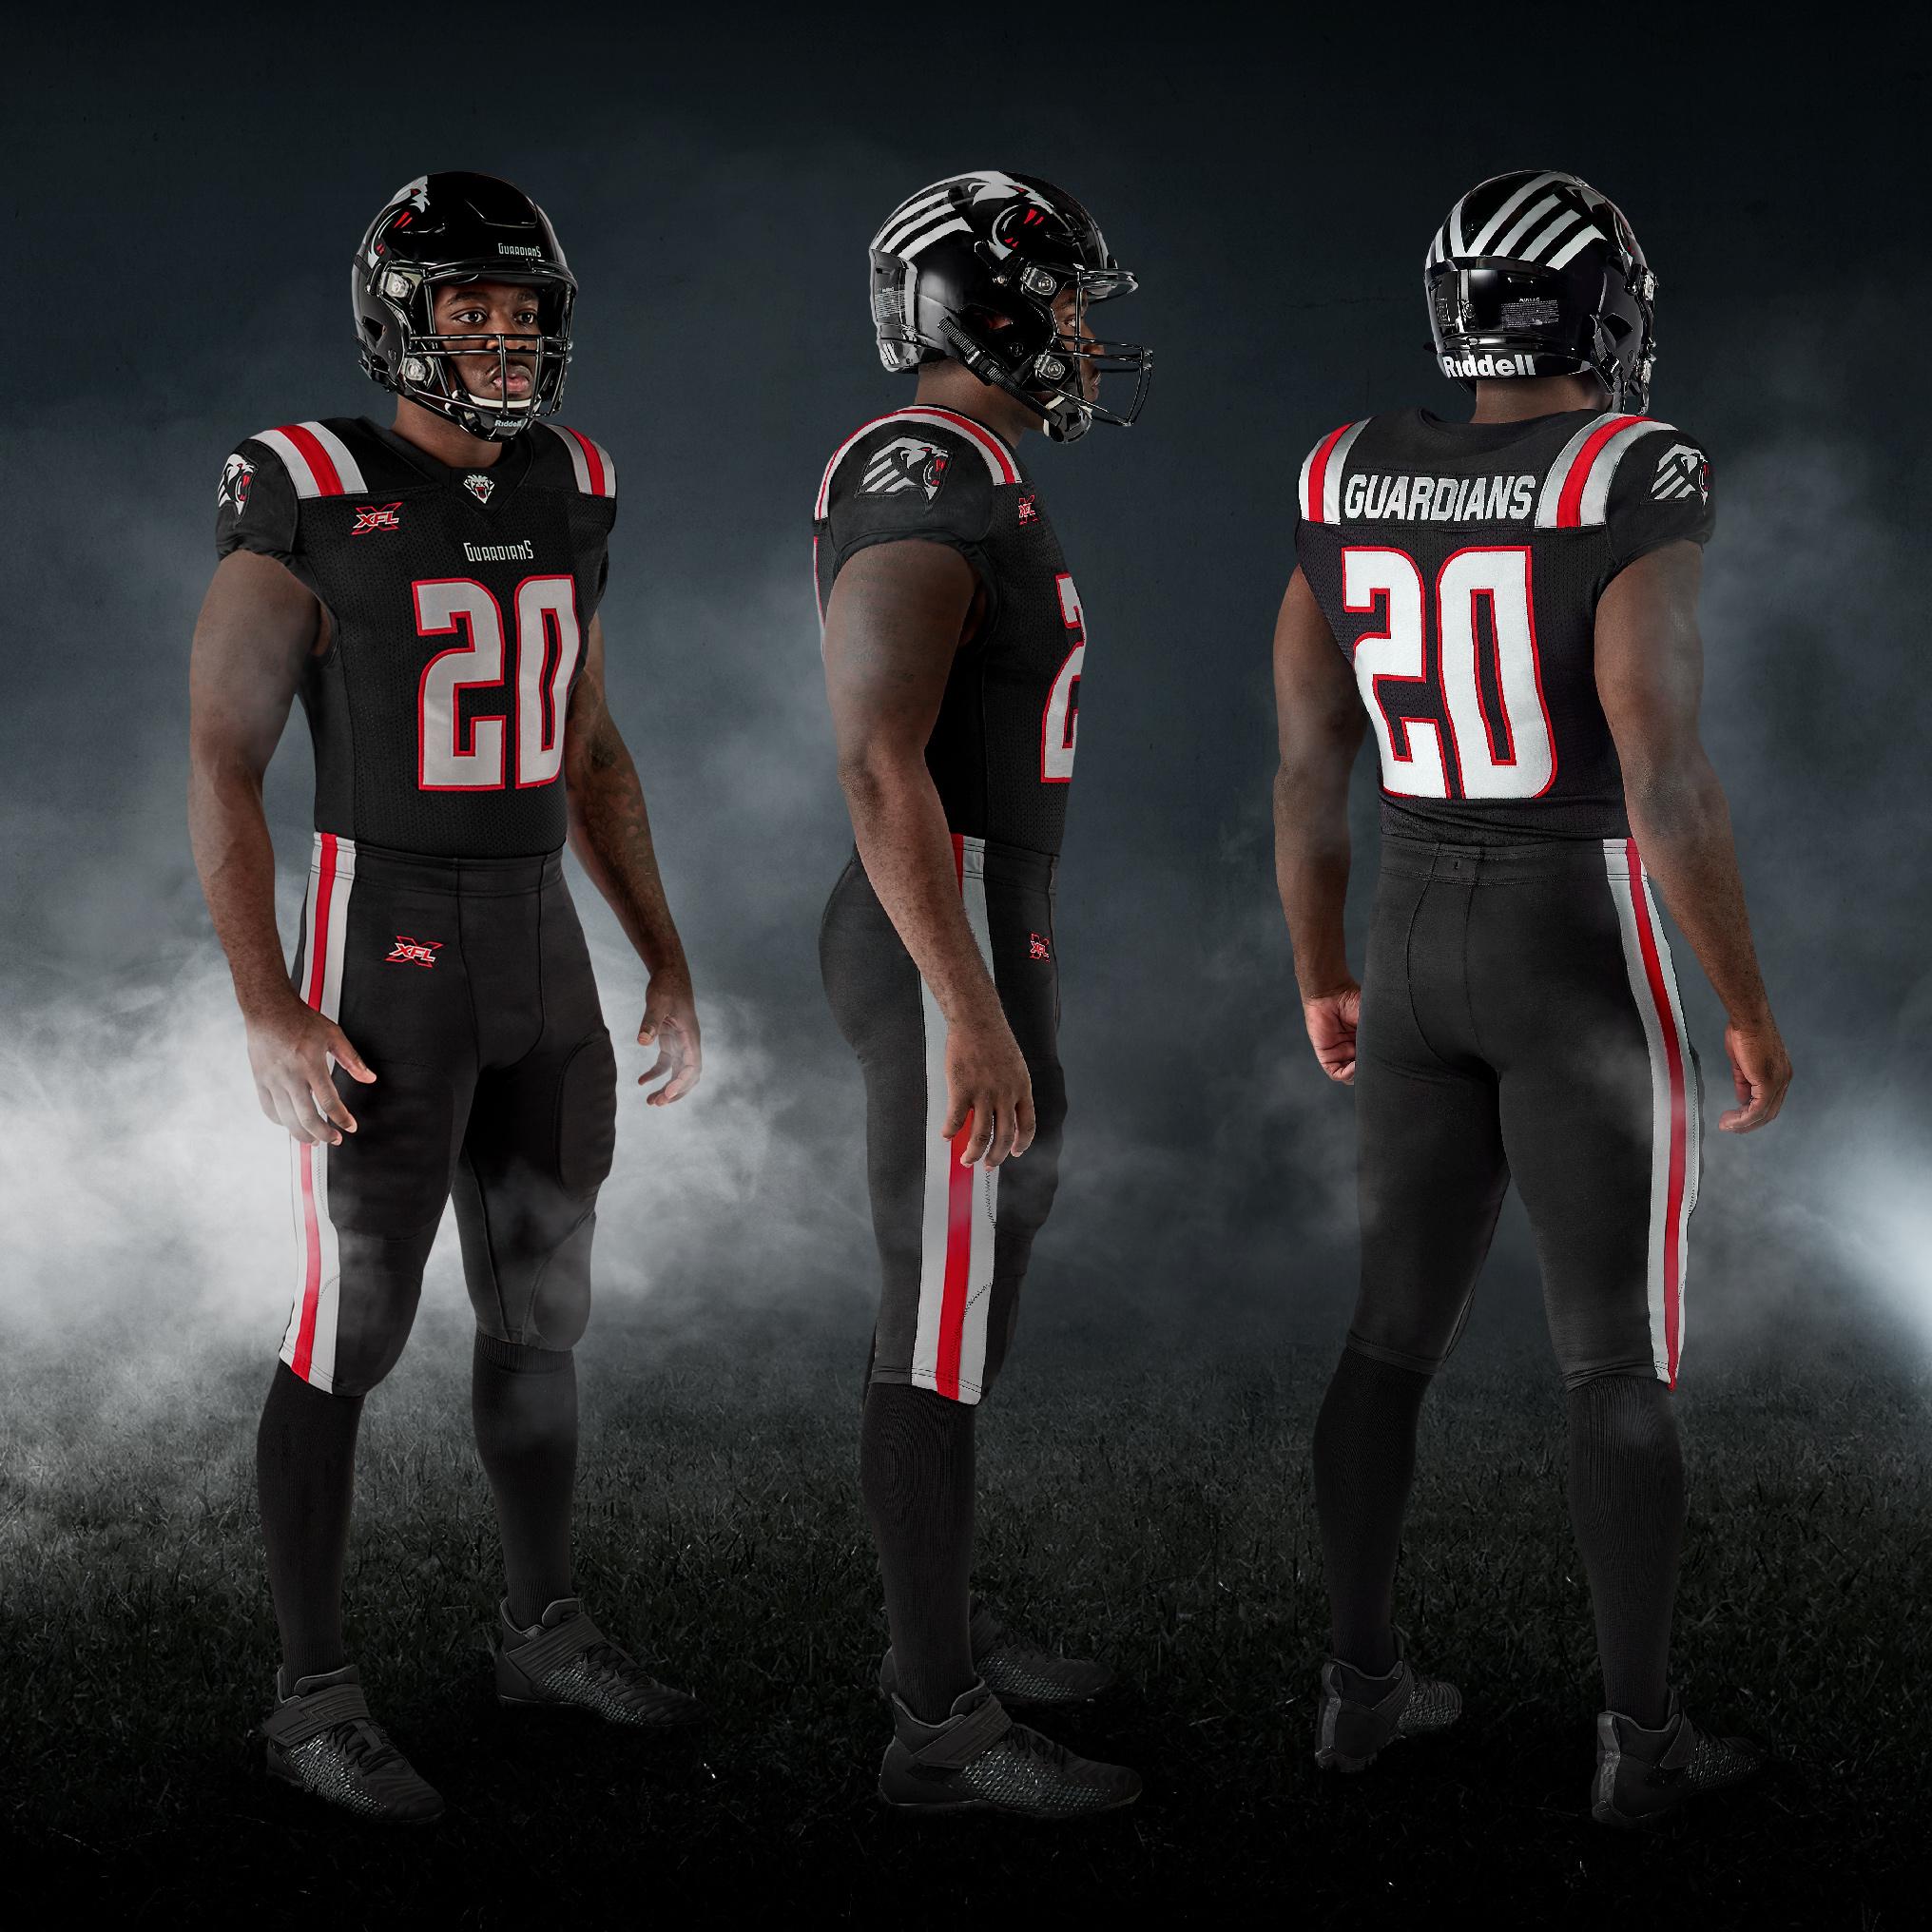 New York Guardians unveil uniforms ahead of 1st season of XFL's rebirth (PHOTO)